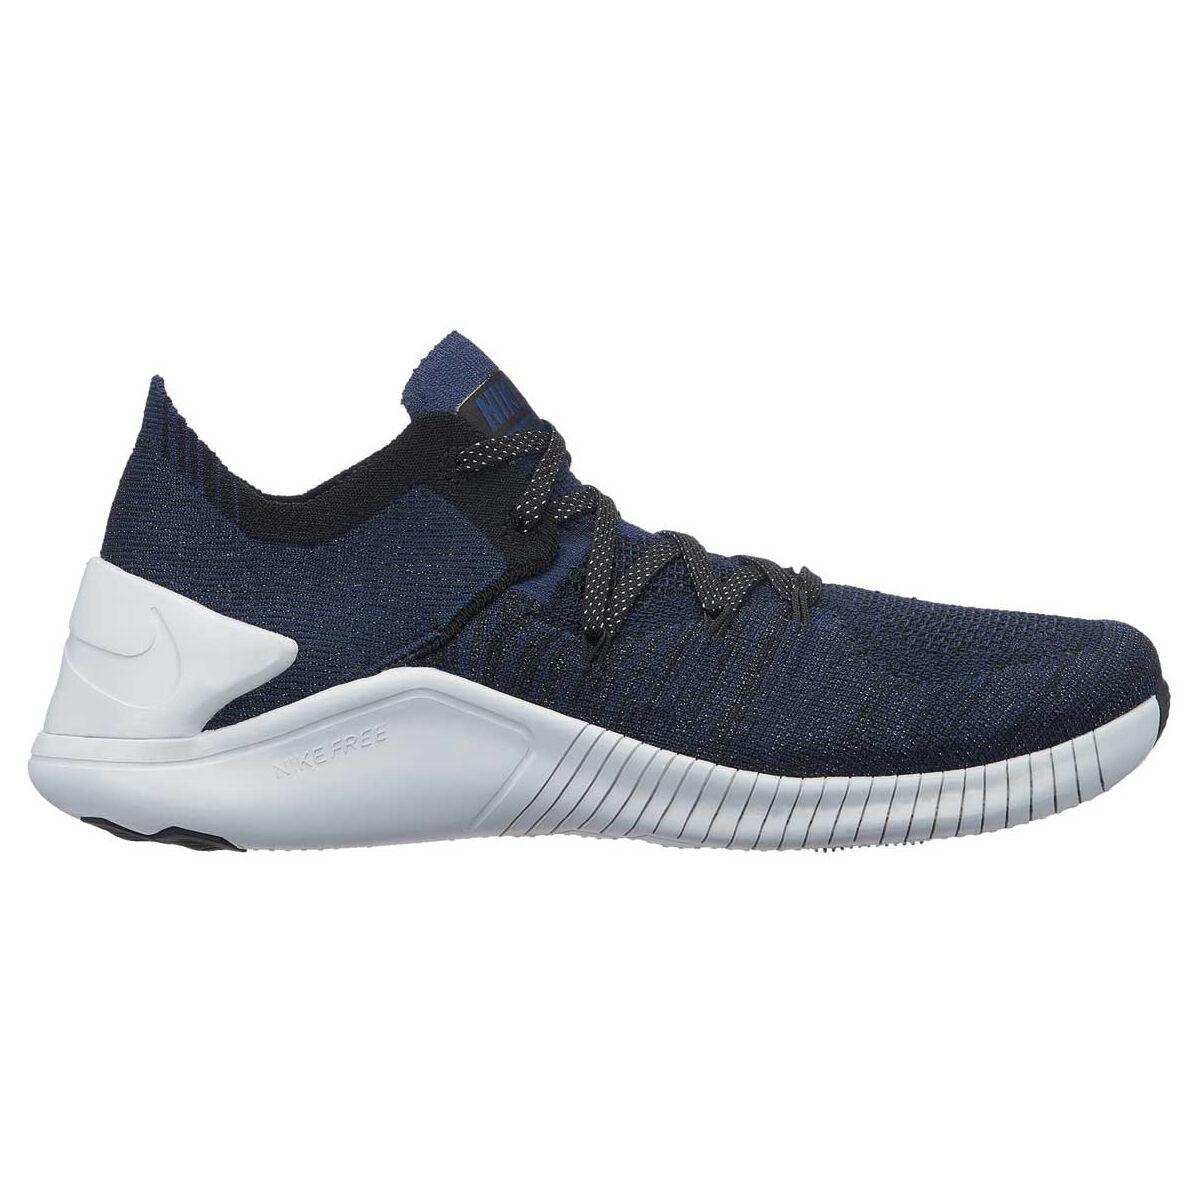 3788d4a98020 Nike Free Tr 6 Metallic Australia Nike Air Max Fury Khaki